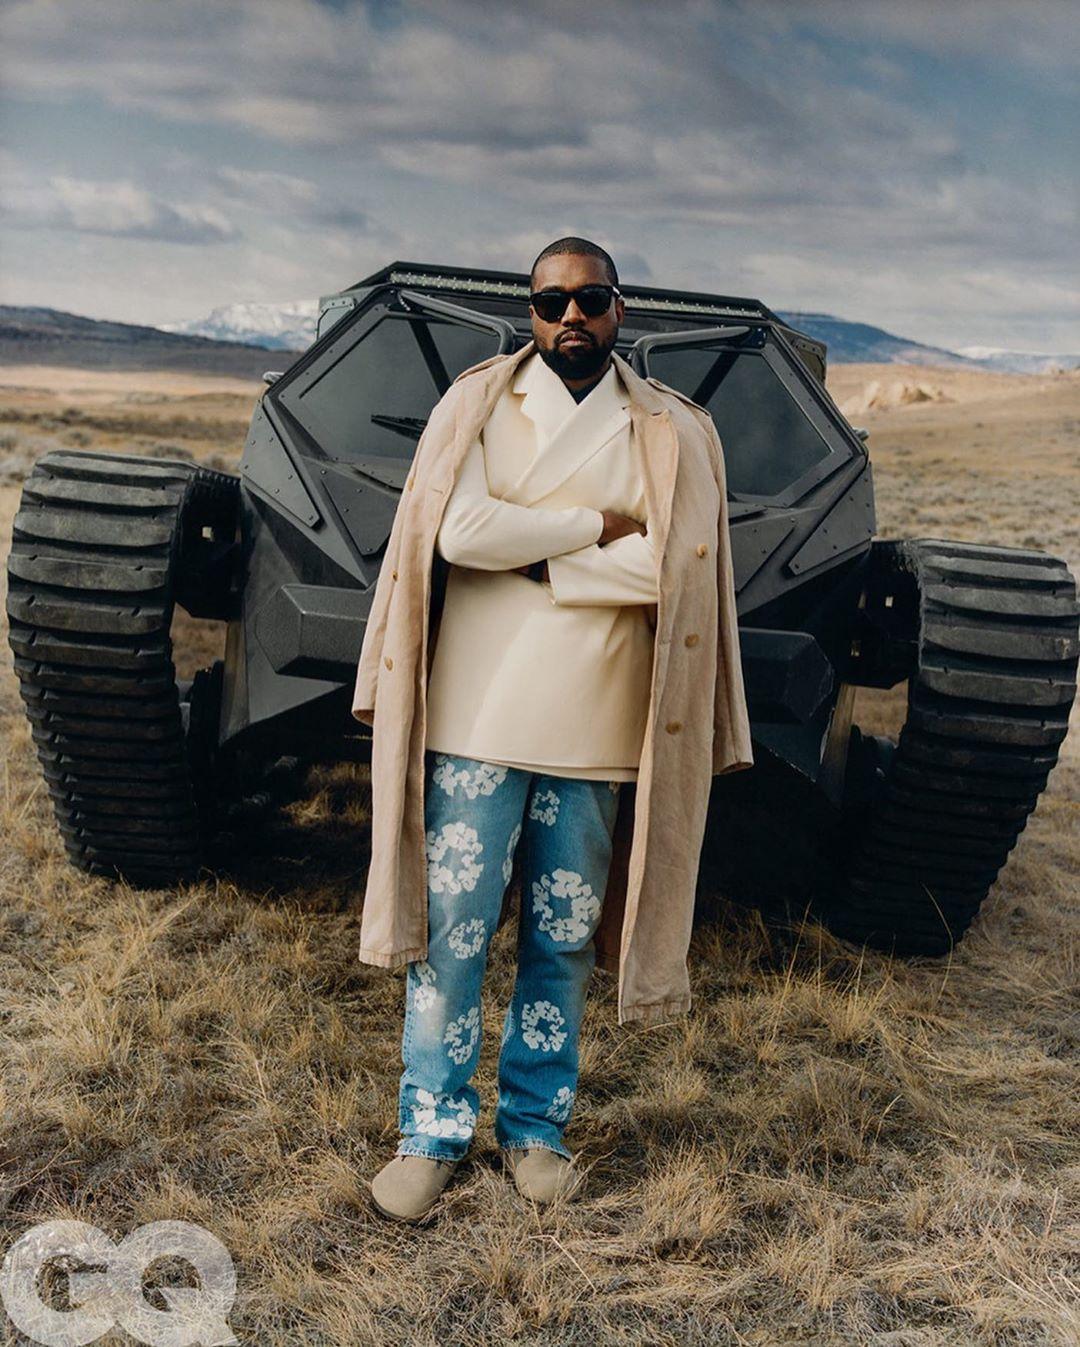 Kanye West 1304020 1-sao nam mac dep-elleman-0420